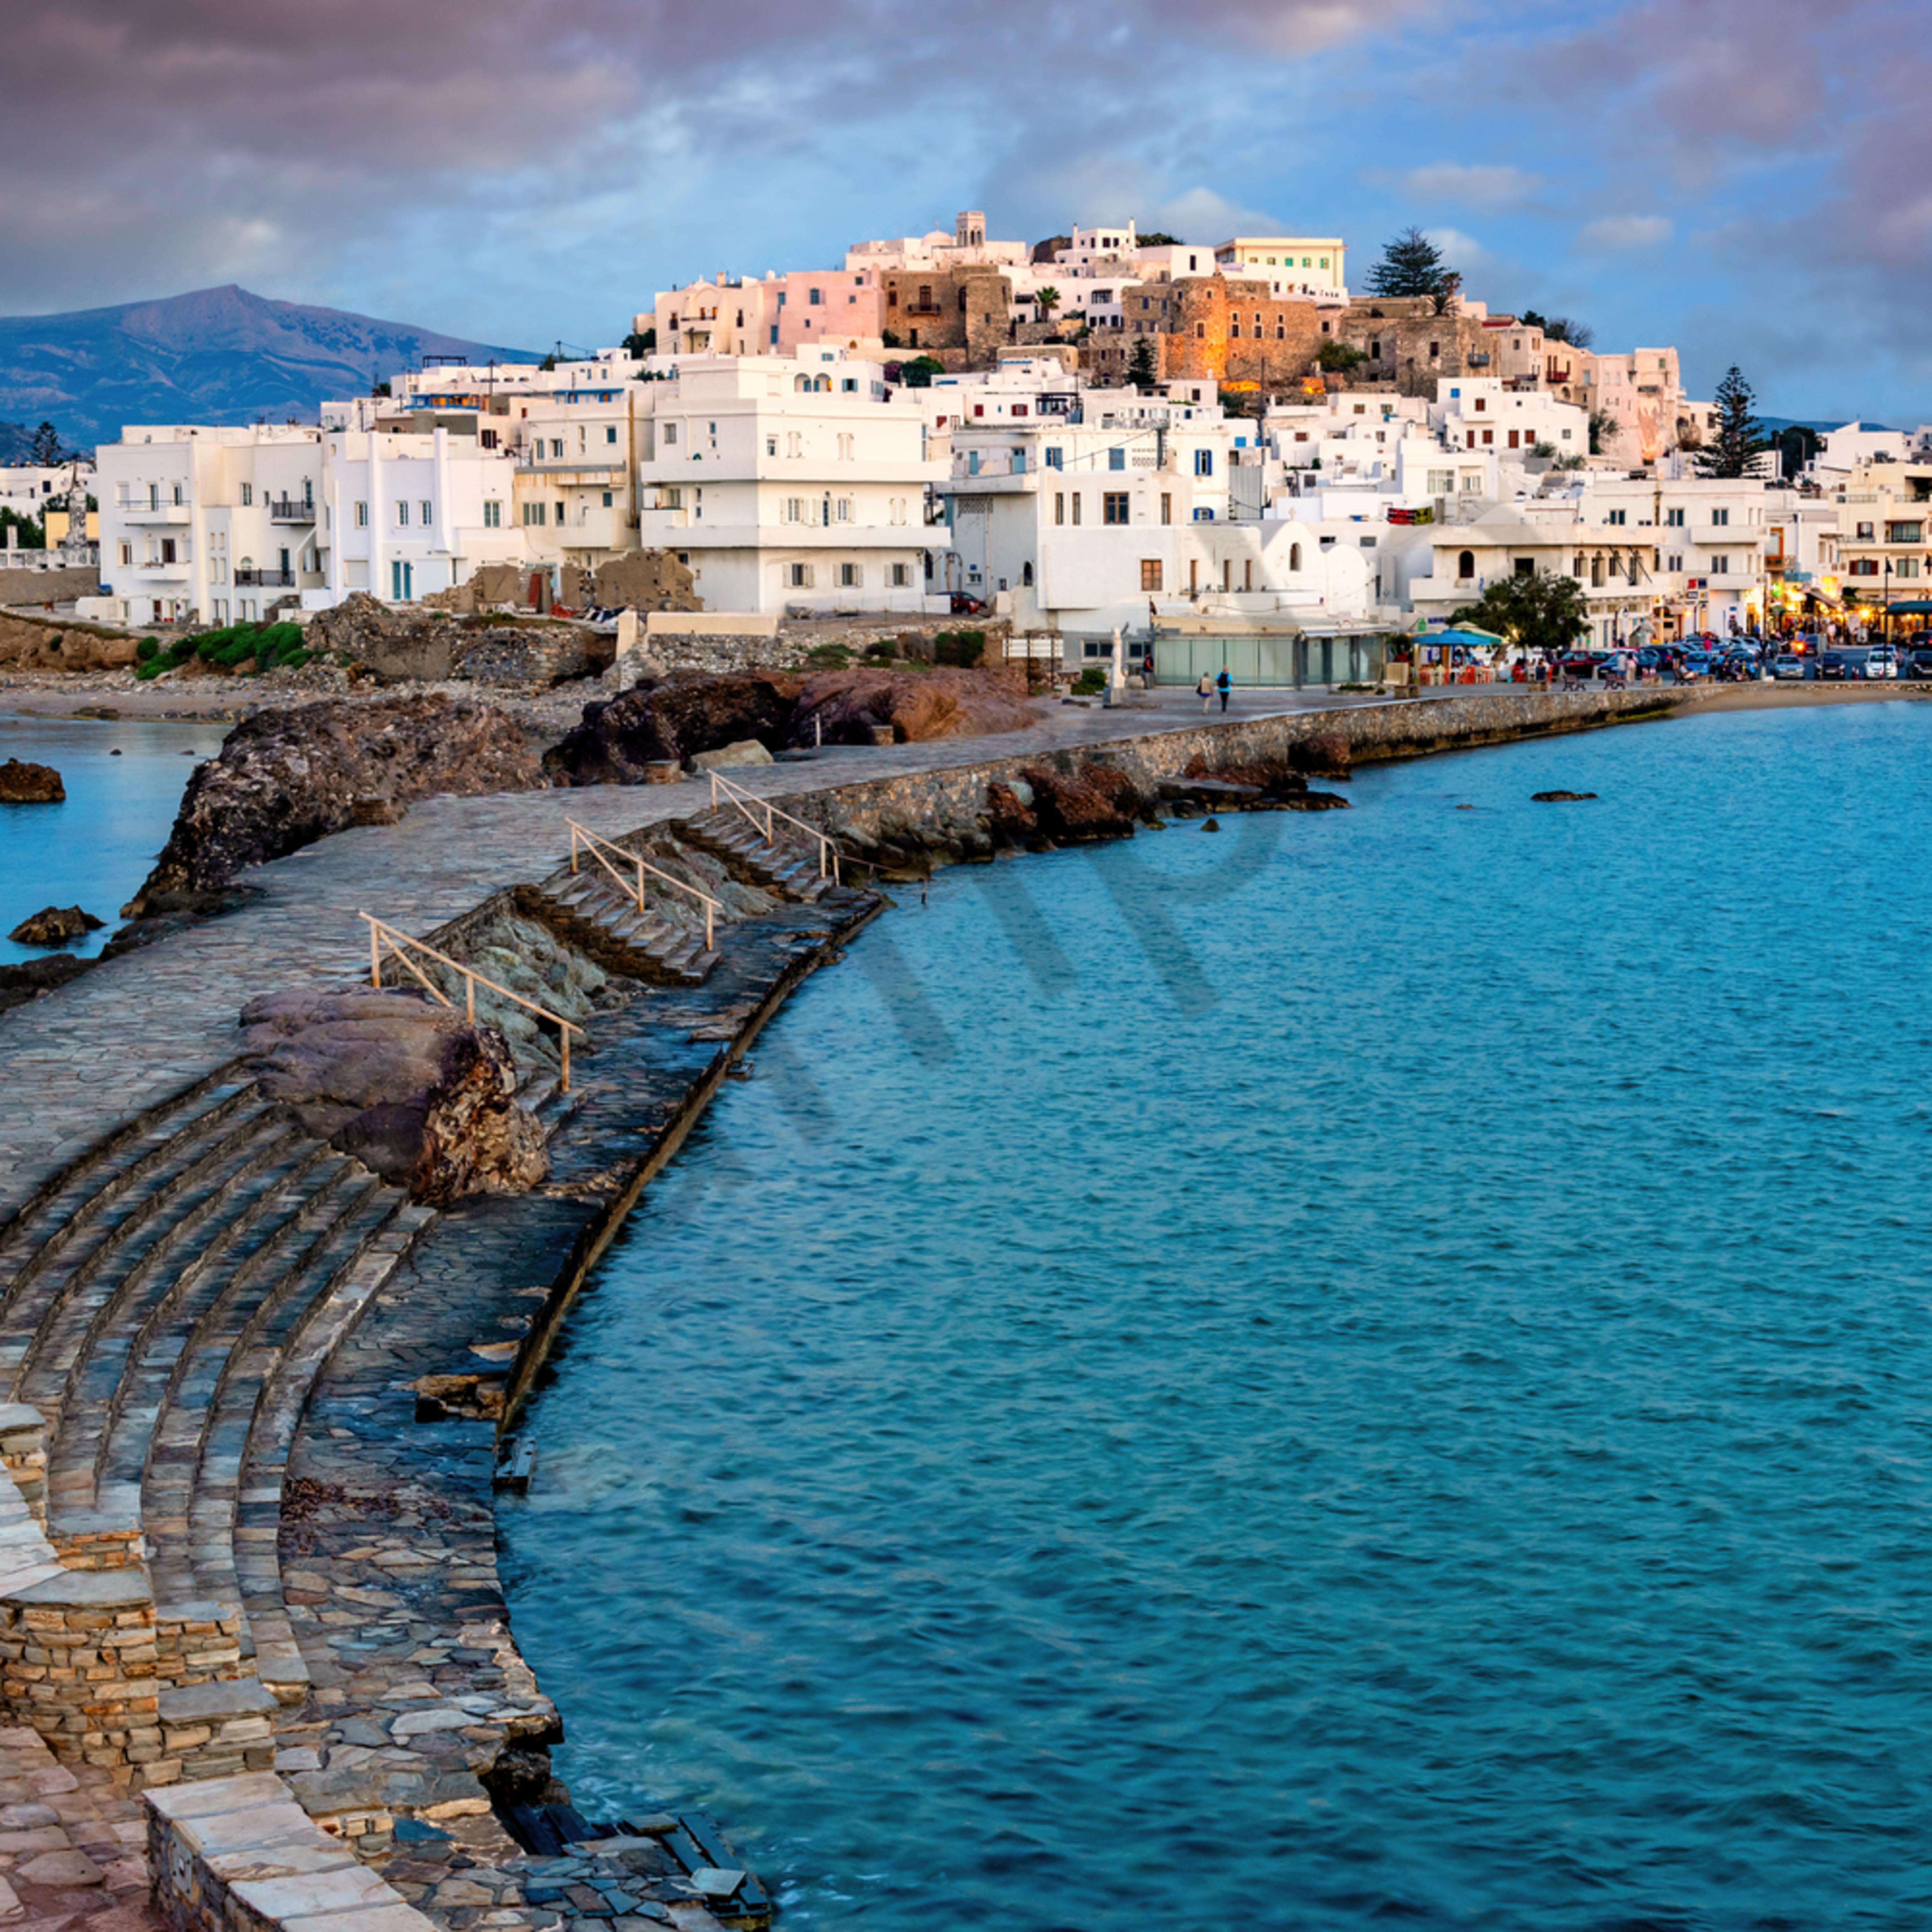 Naxos greece by waterfront b7hekp